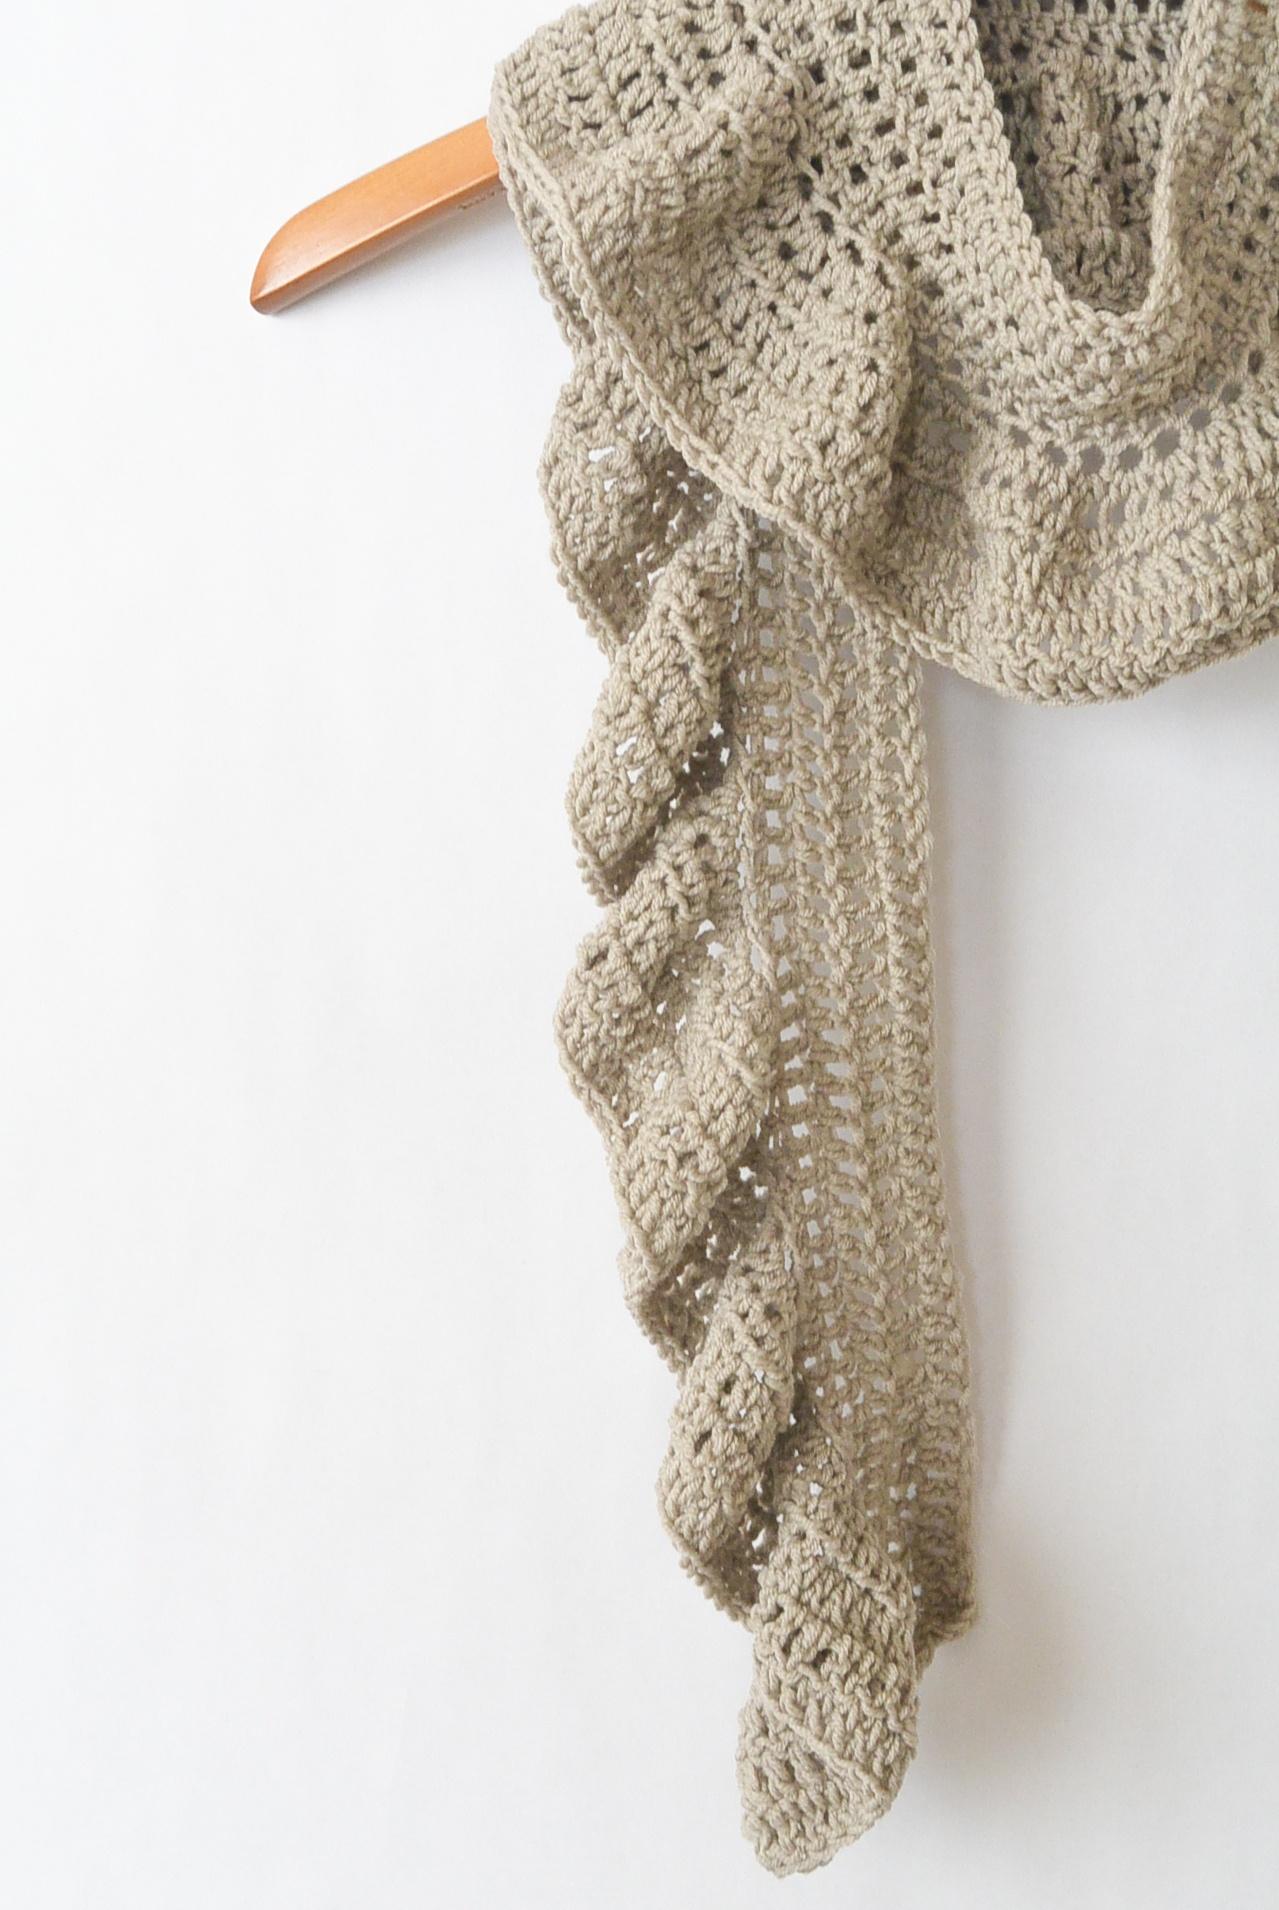 Merino Crocheted Ruffle Scarf Pattern – Mama In A Stitch - Free Printable Crochet Scarf Patterns